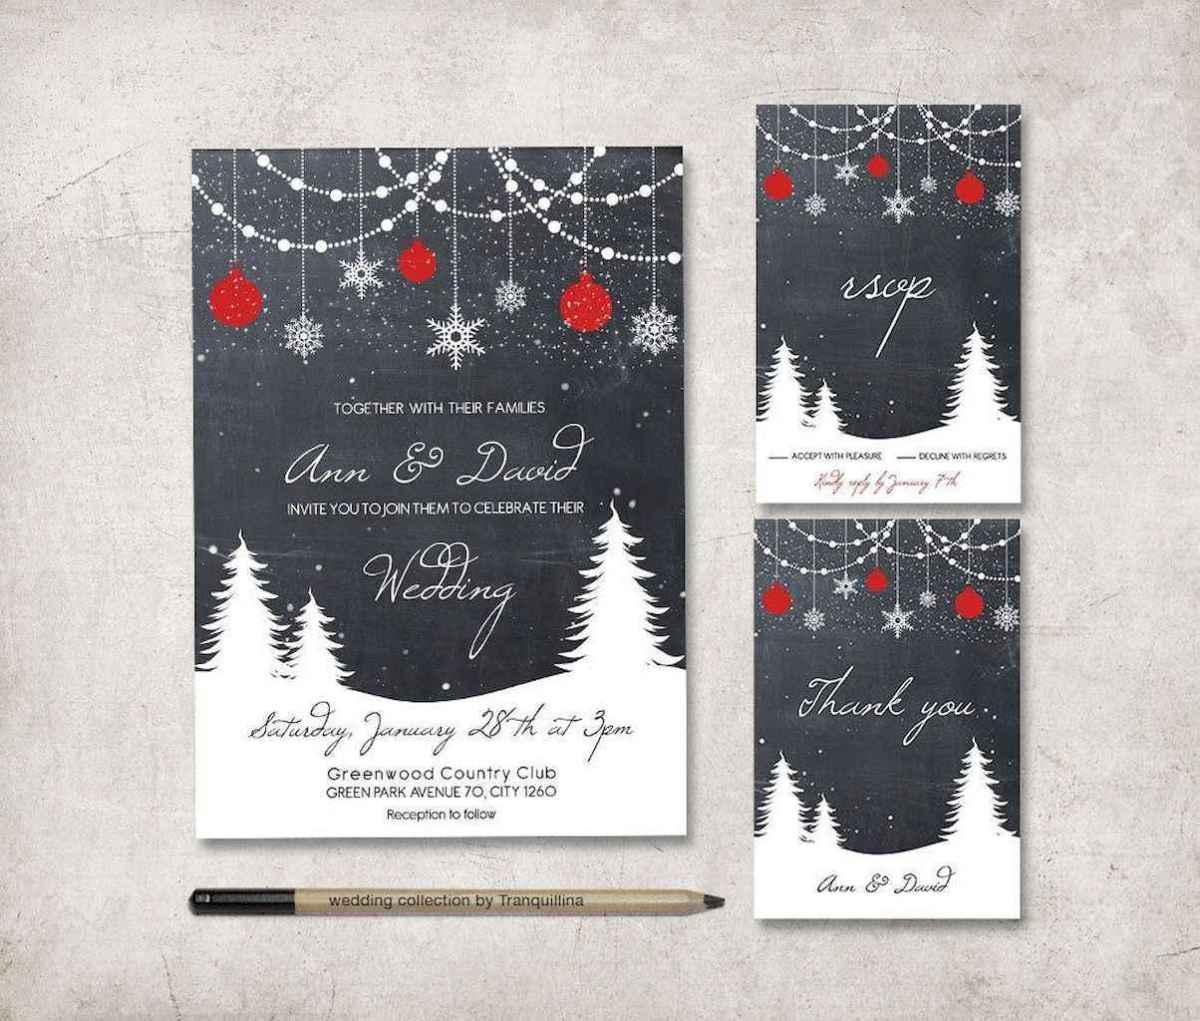 75 Elegant Christmas Wedding Invitations Ideas